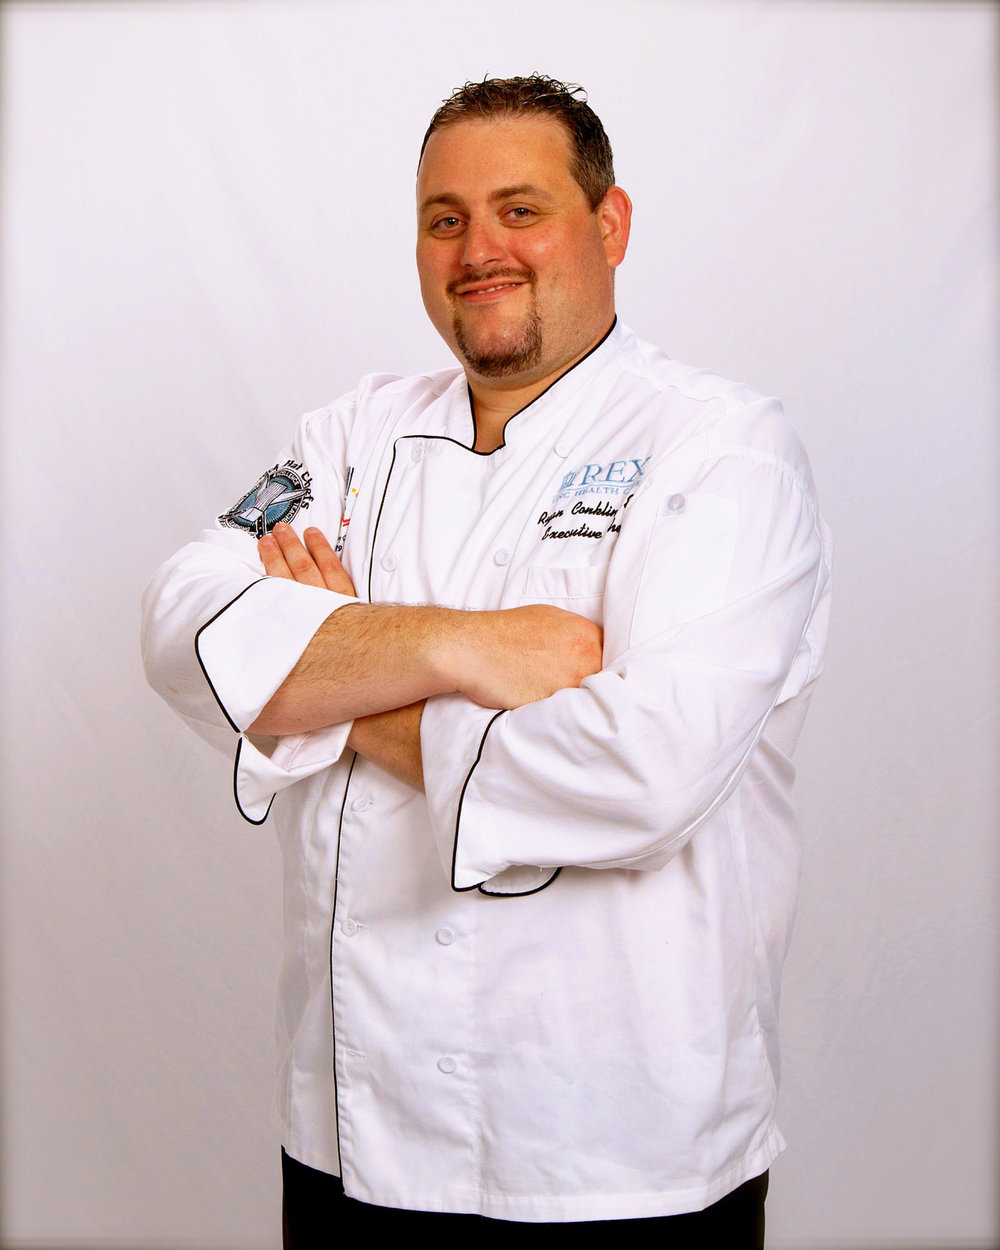 Ryan Conklin, executive chef at UNC REX